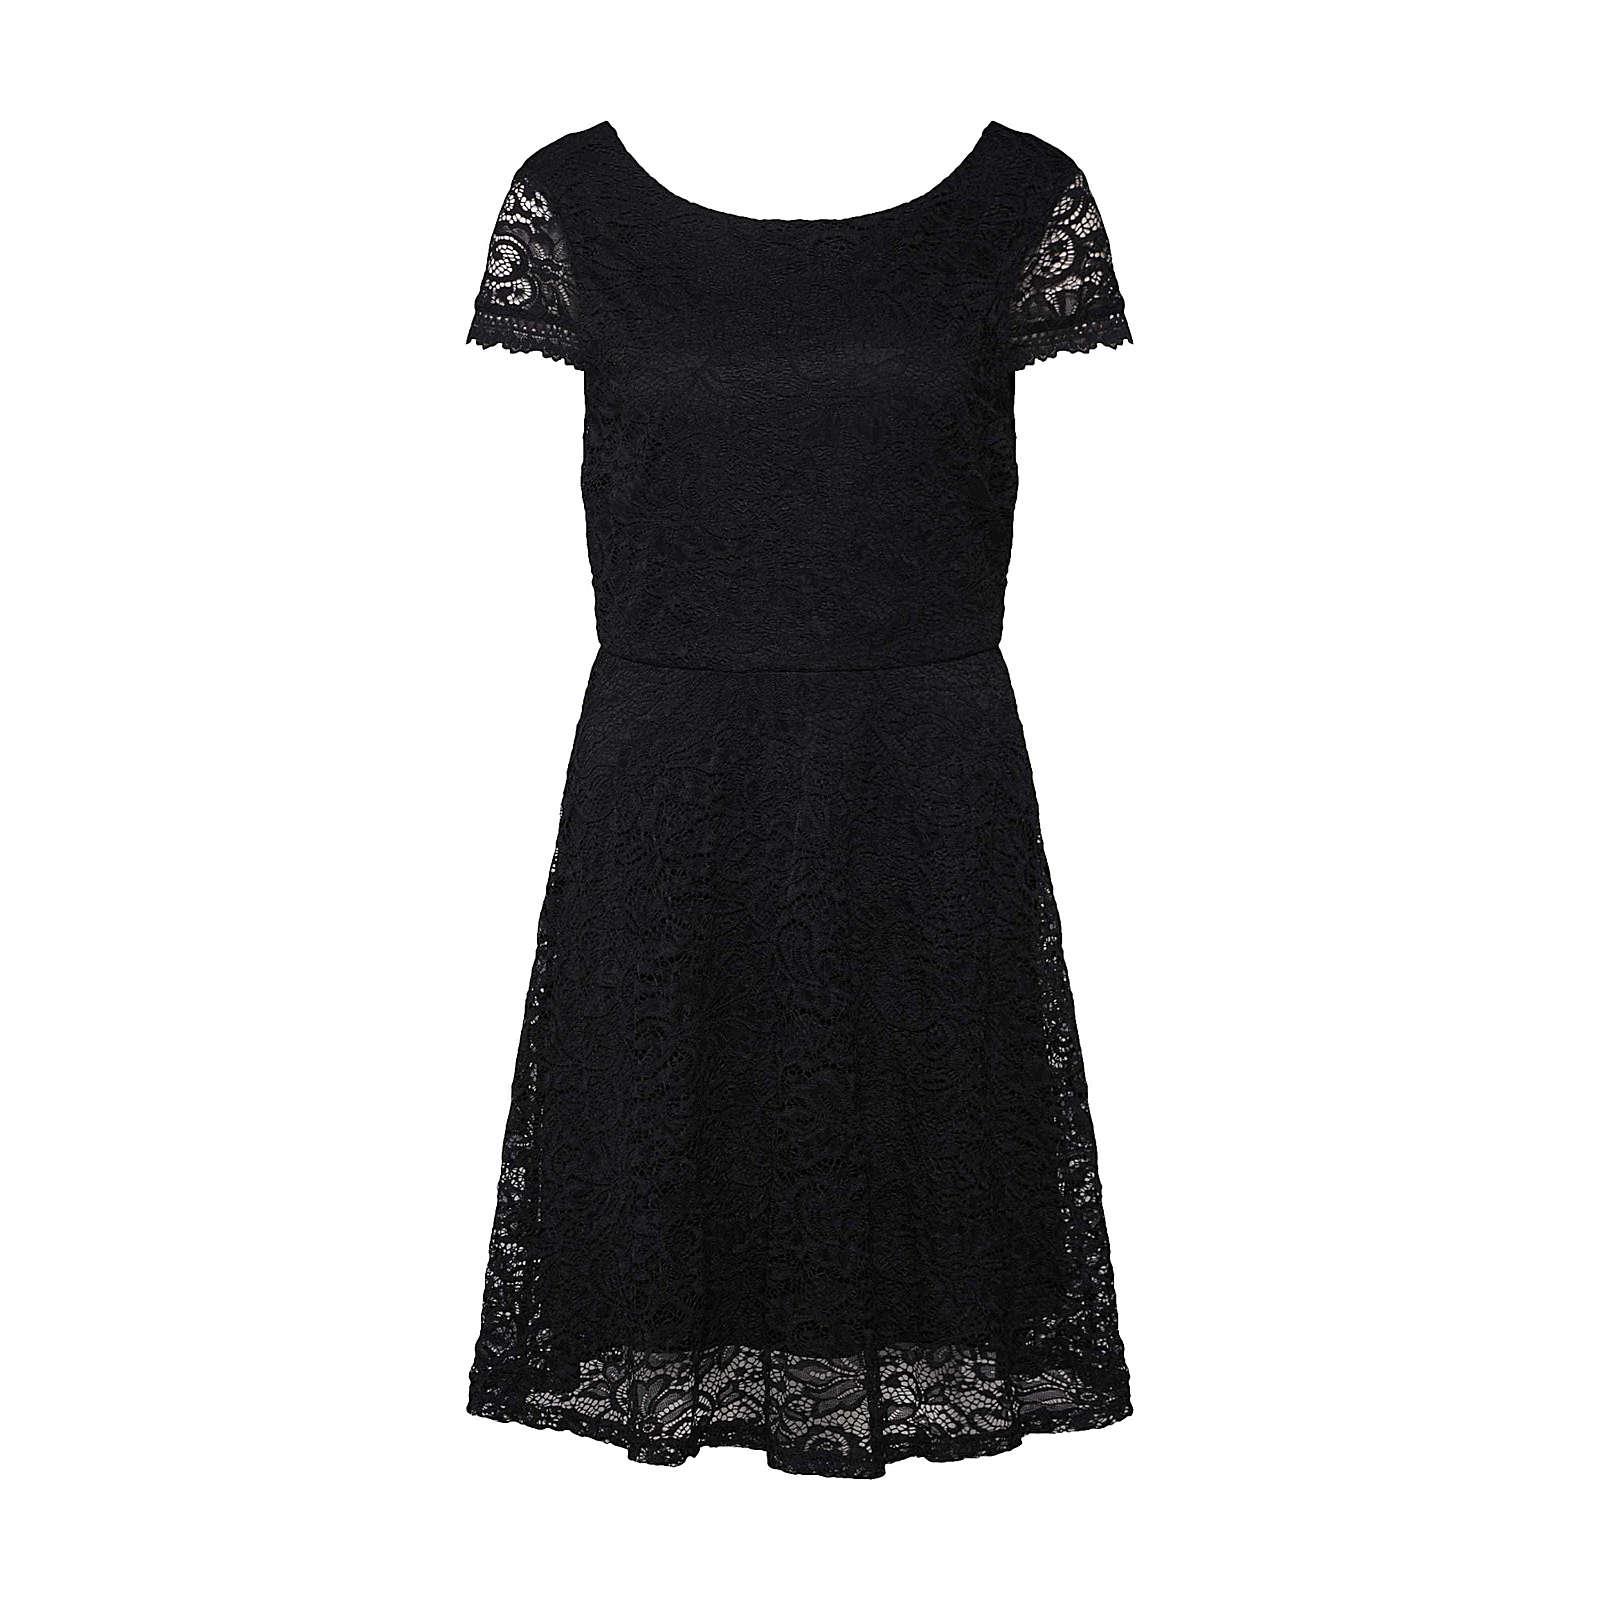 VERO MODA Kleid VMSASSA CAPSL SHORT DRESS BOO JRS Sommerkleider schwarz Damen Gr. 40